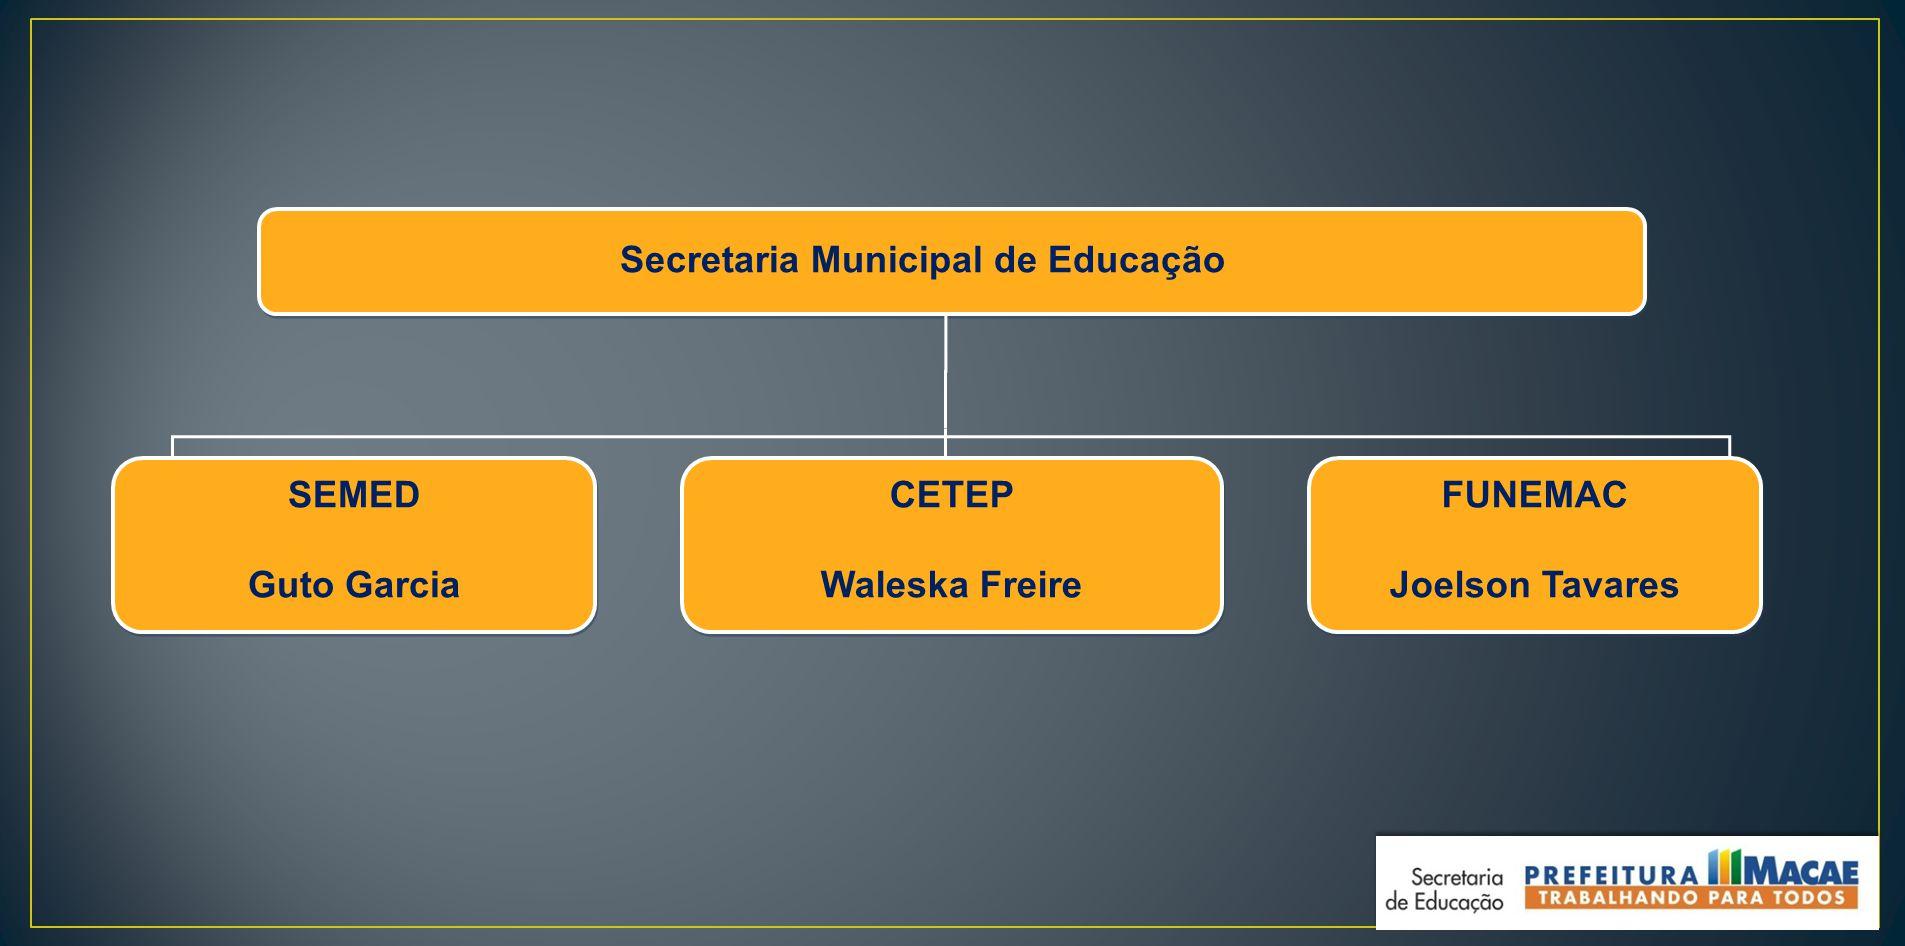 Secretaria Municipal de Educação CETEP Waleska Freire CETEP Waleska Freire FUNEMAC Joelson Tavares FUNEMAC Joelson Tavares SEMED Guto Garcia SEMED Gut